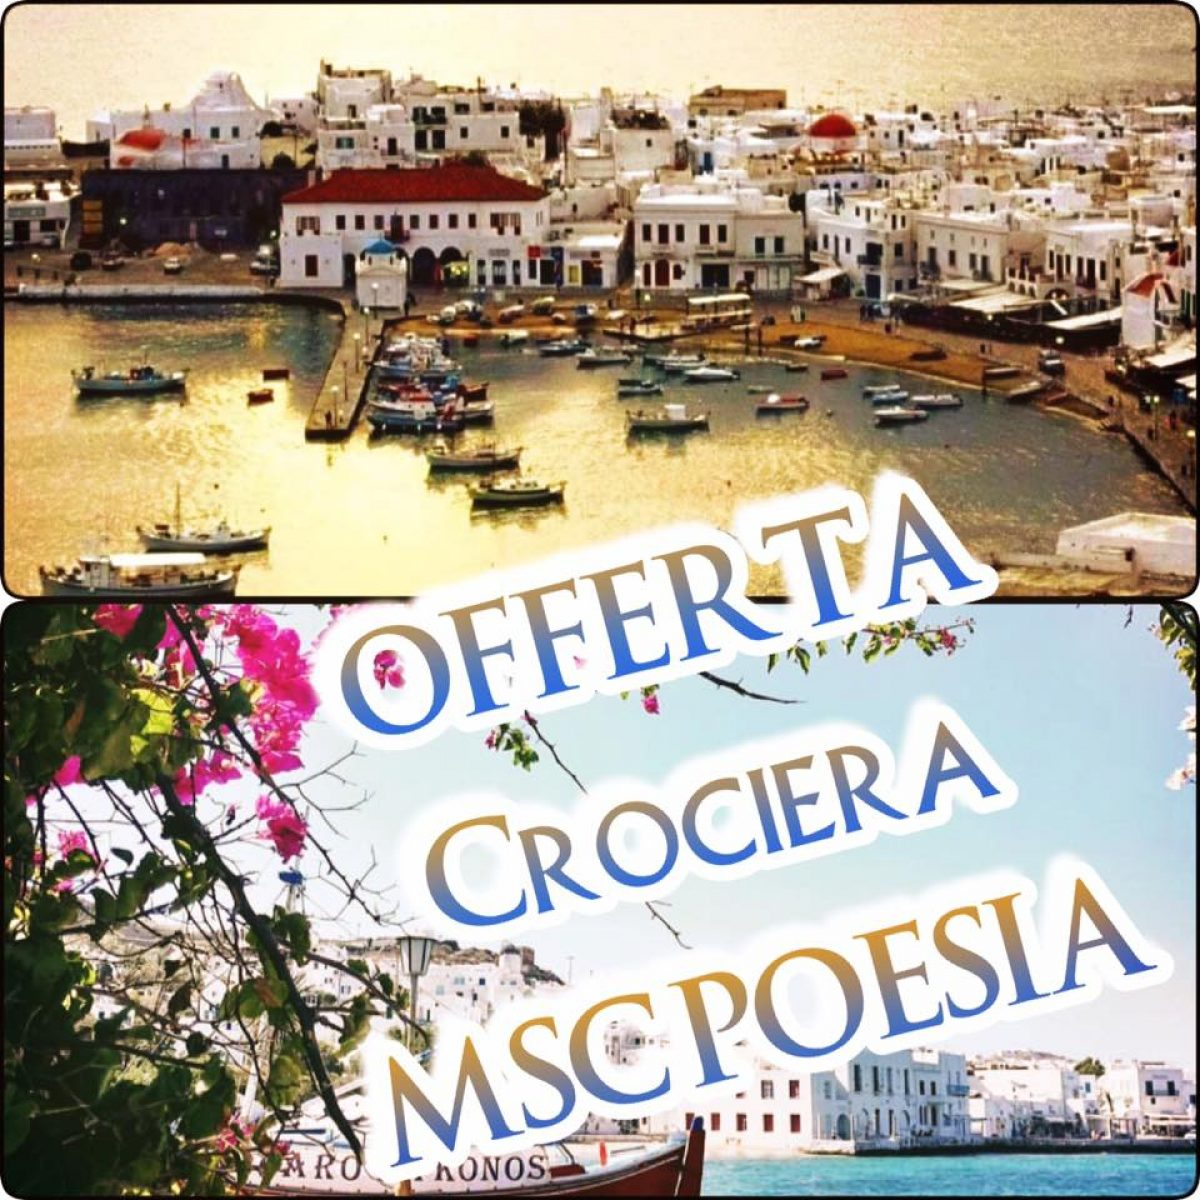 OFFERTA CROCIERA MSC POESIA